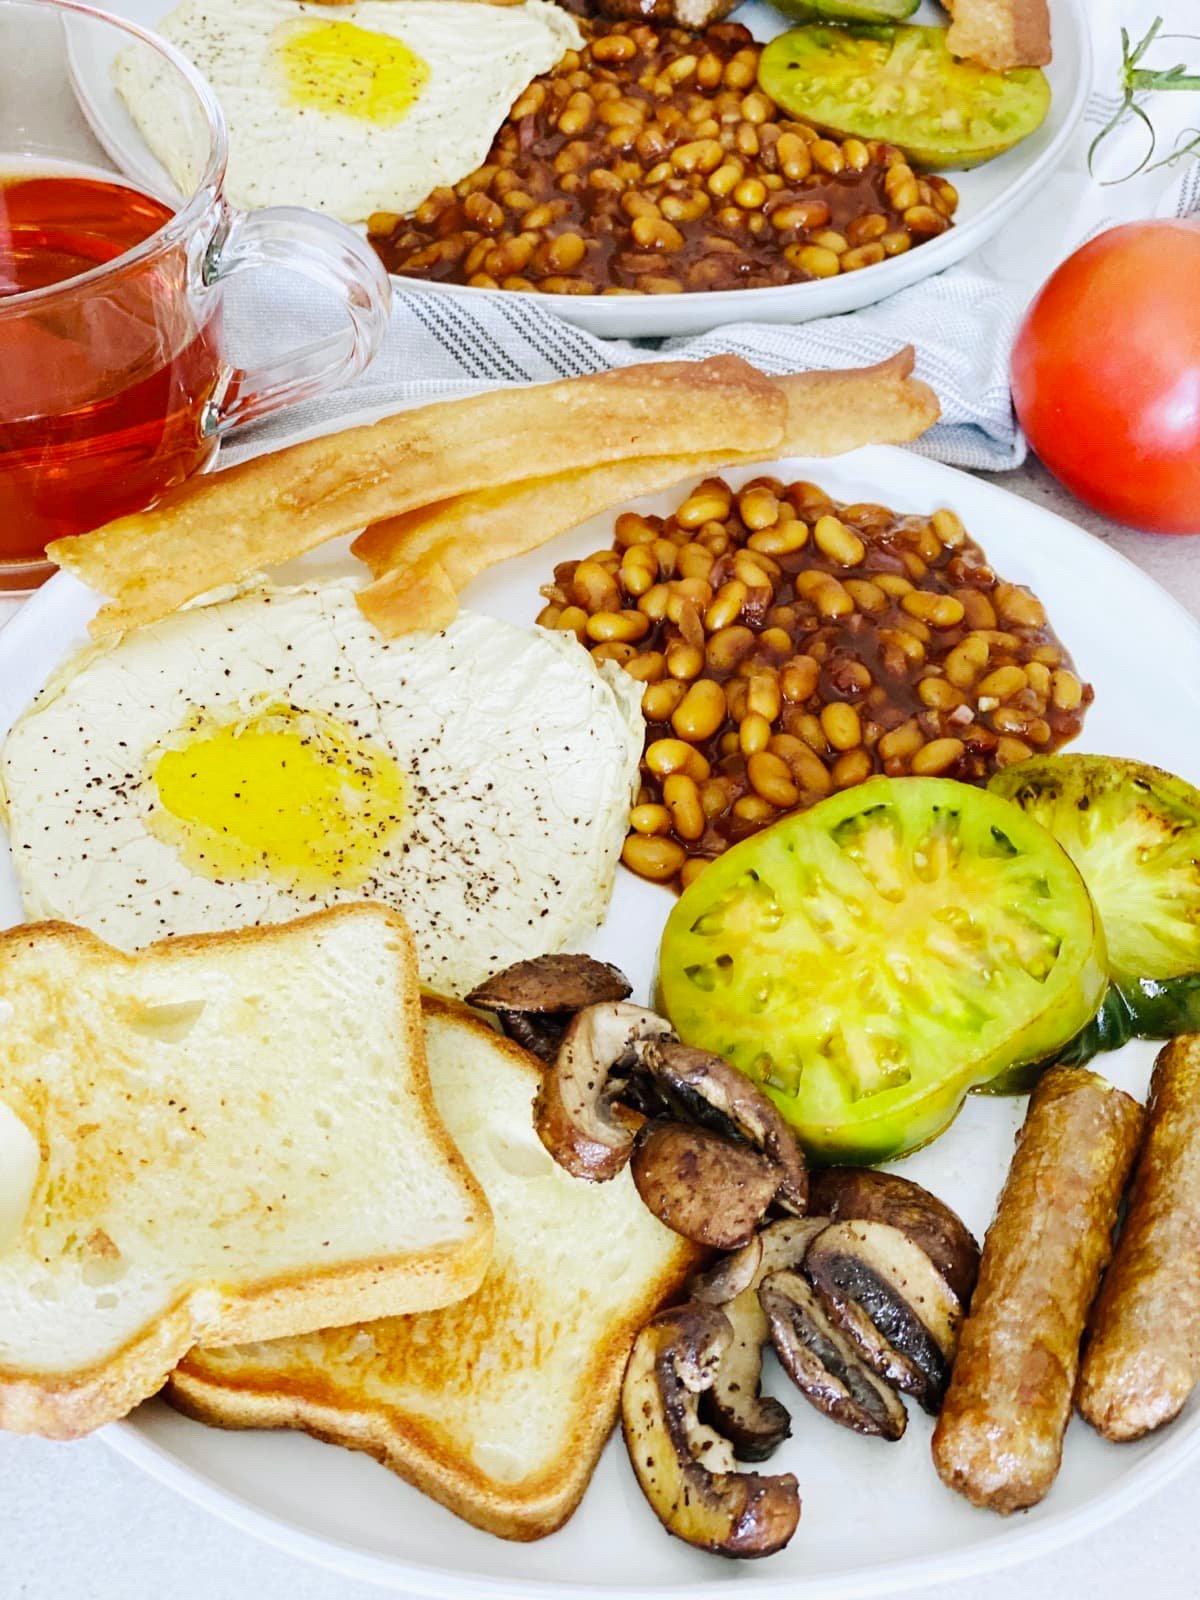 A Vegan English Breakfast With Gluten-free Toast